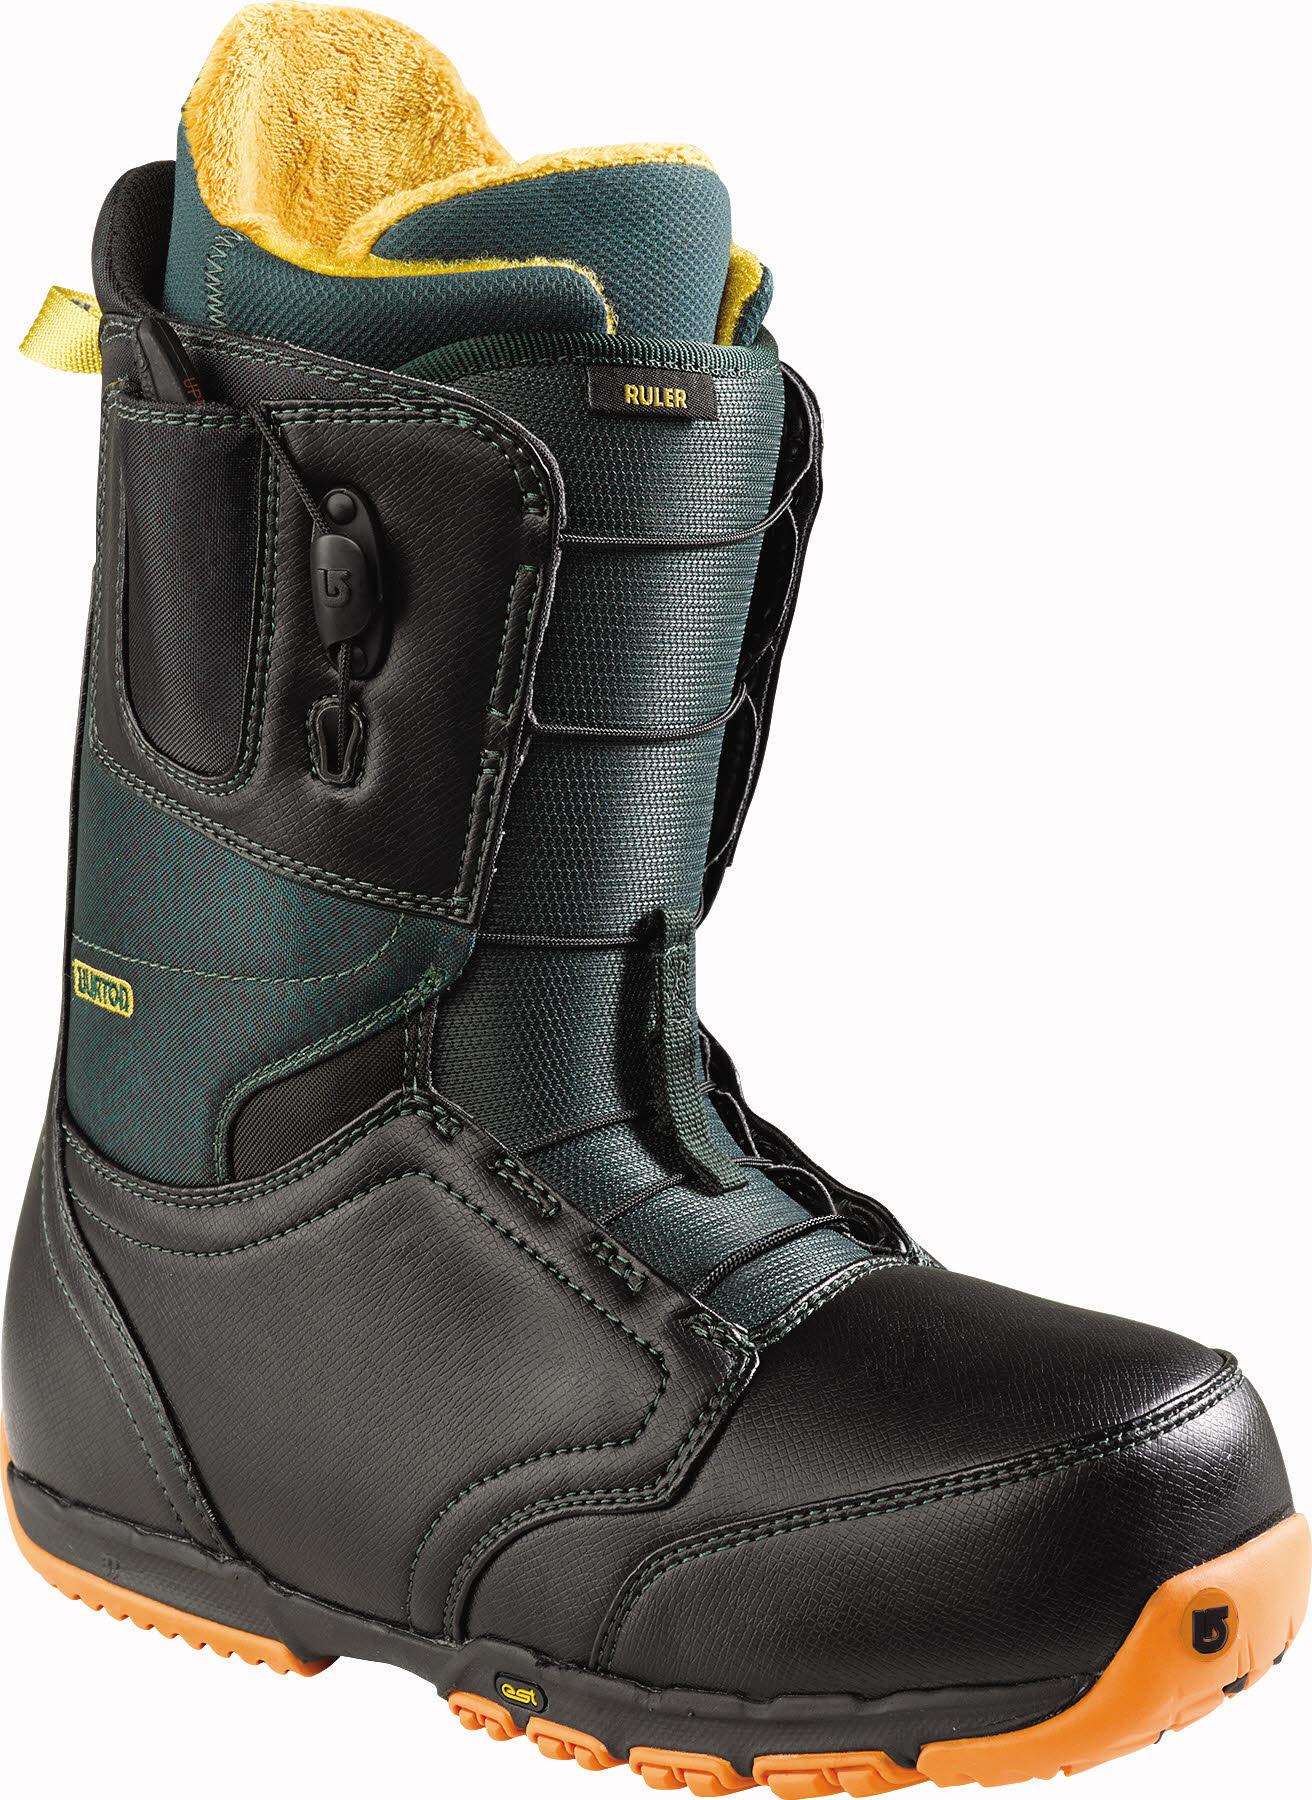 Boot Burton Ruler 14/15 black/green